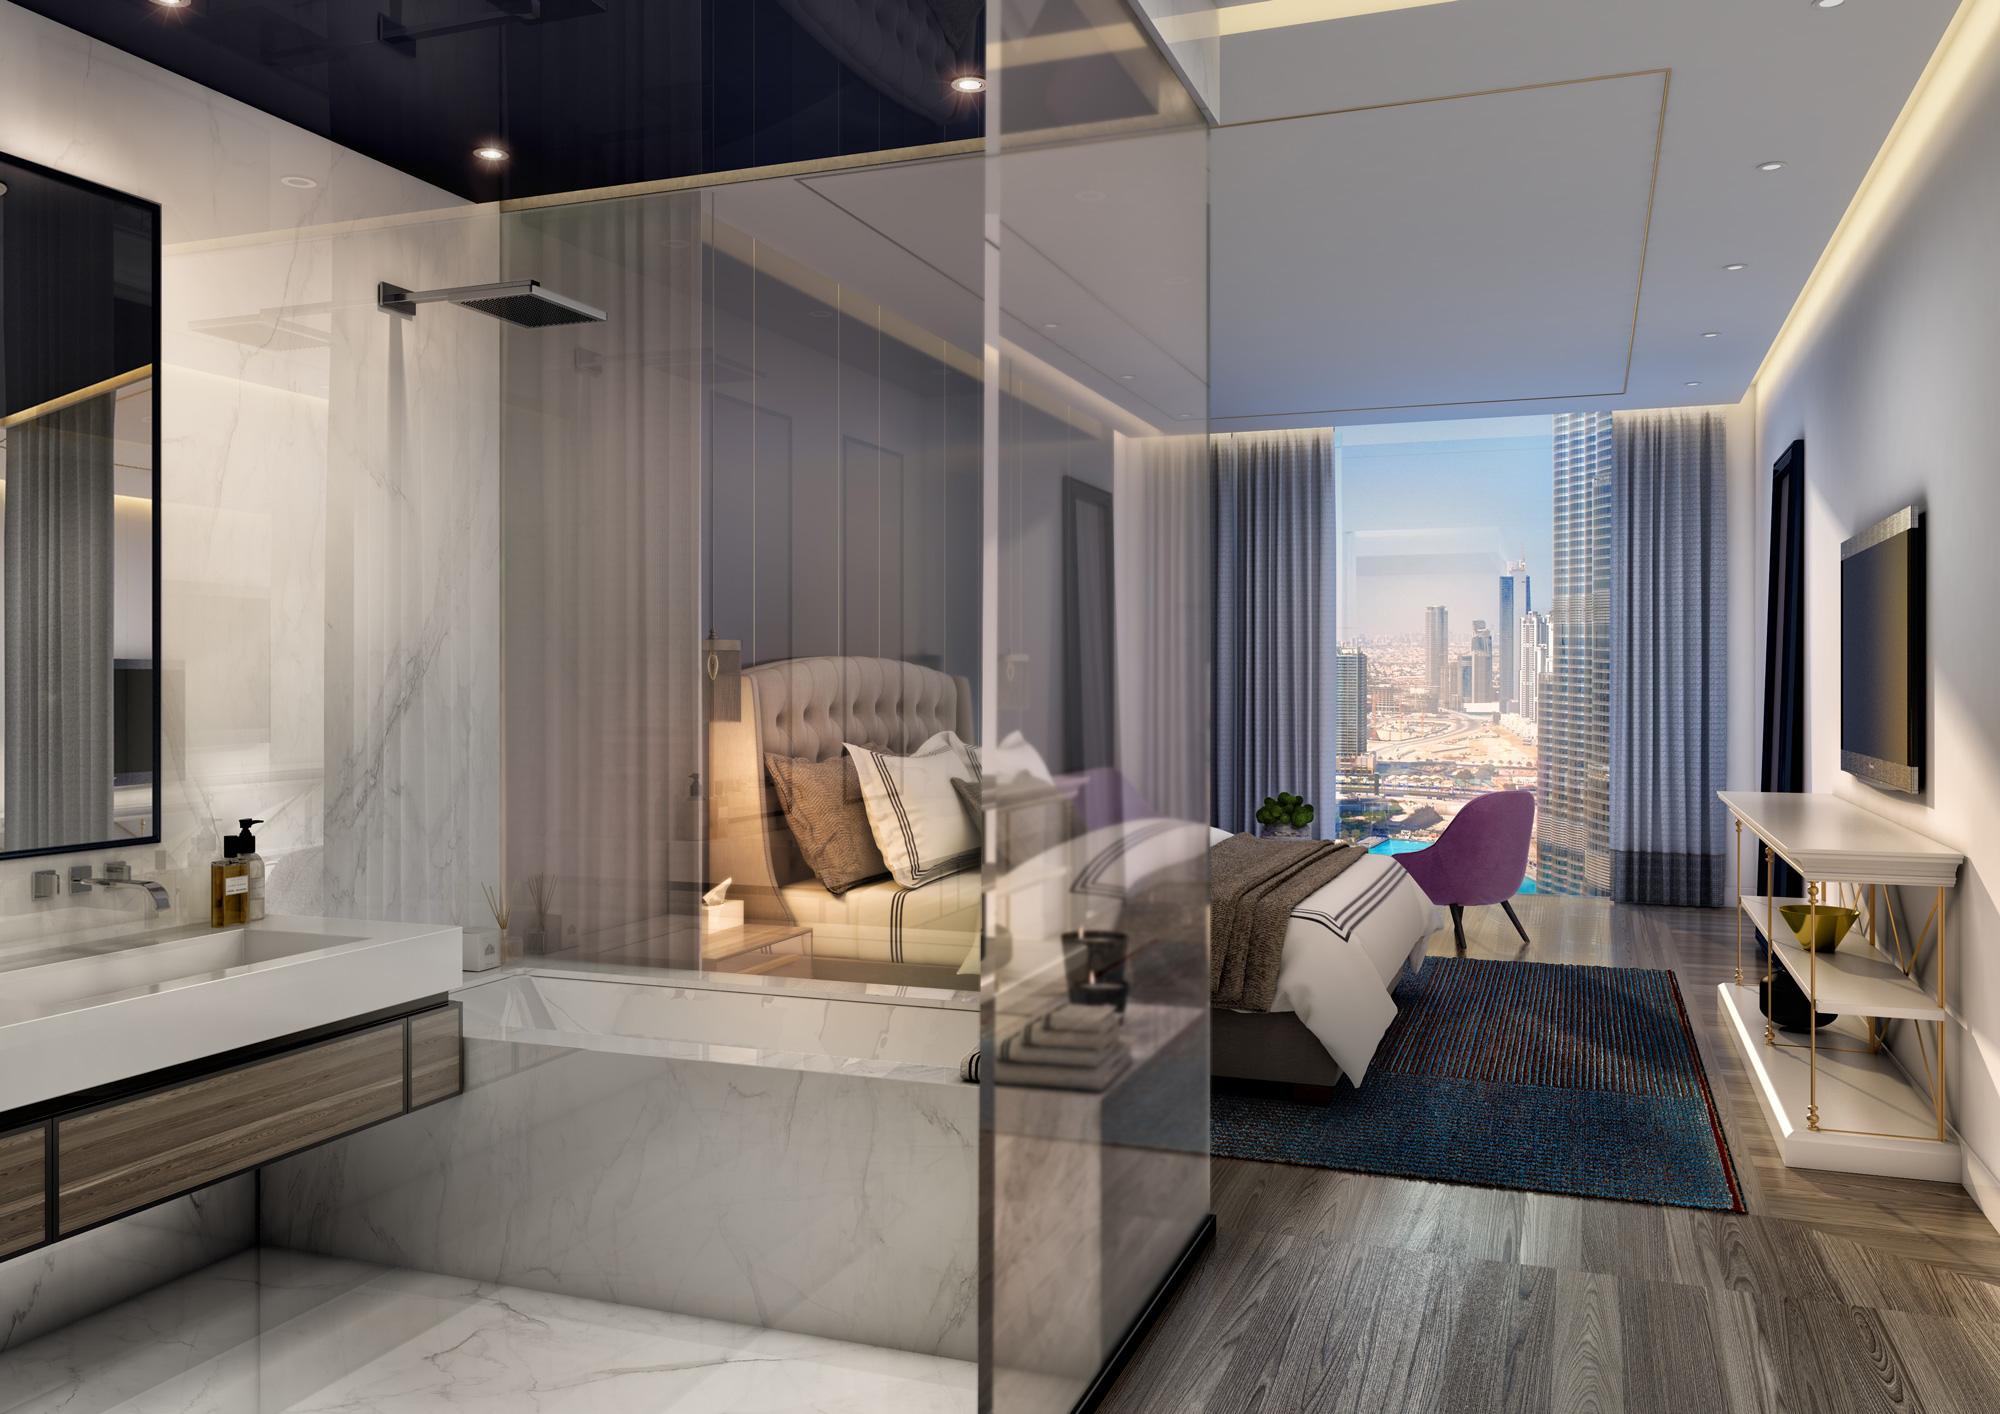 breathtaking-hotel-interior-photos-ideas-simple-design-decoration-of